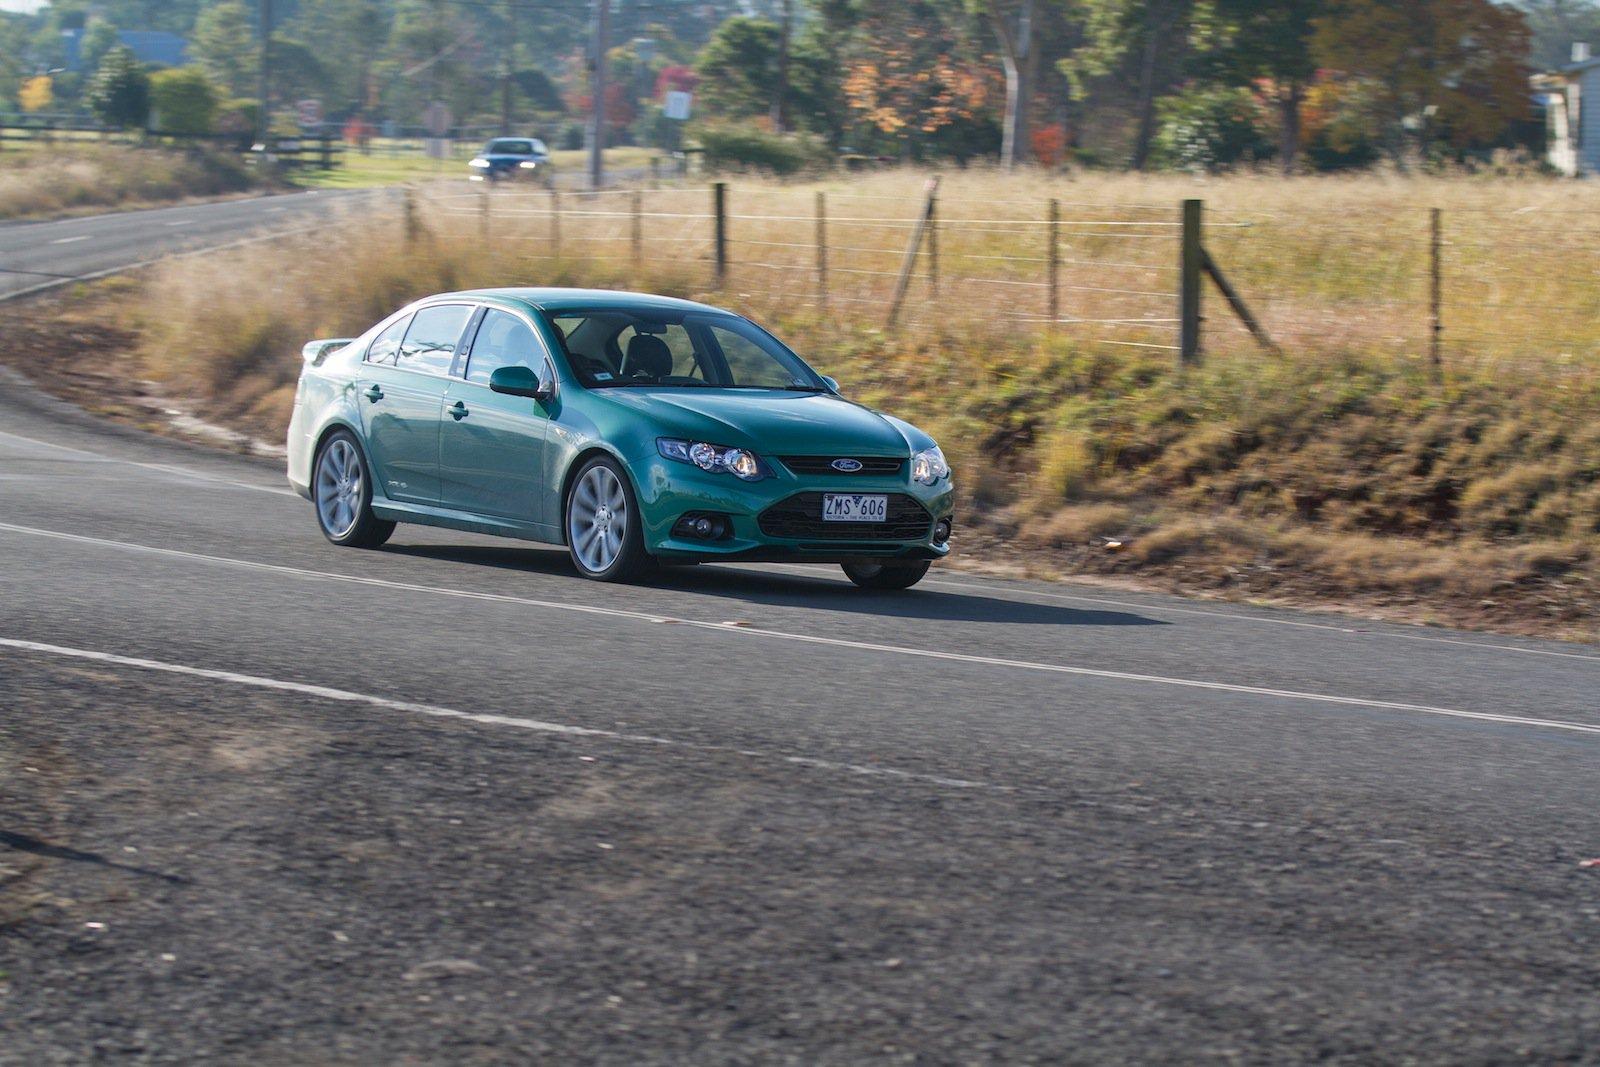 Holden Commodore SV6 v Ford Falcon XR6: Comparison Review